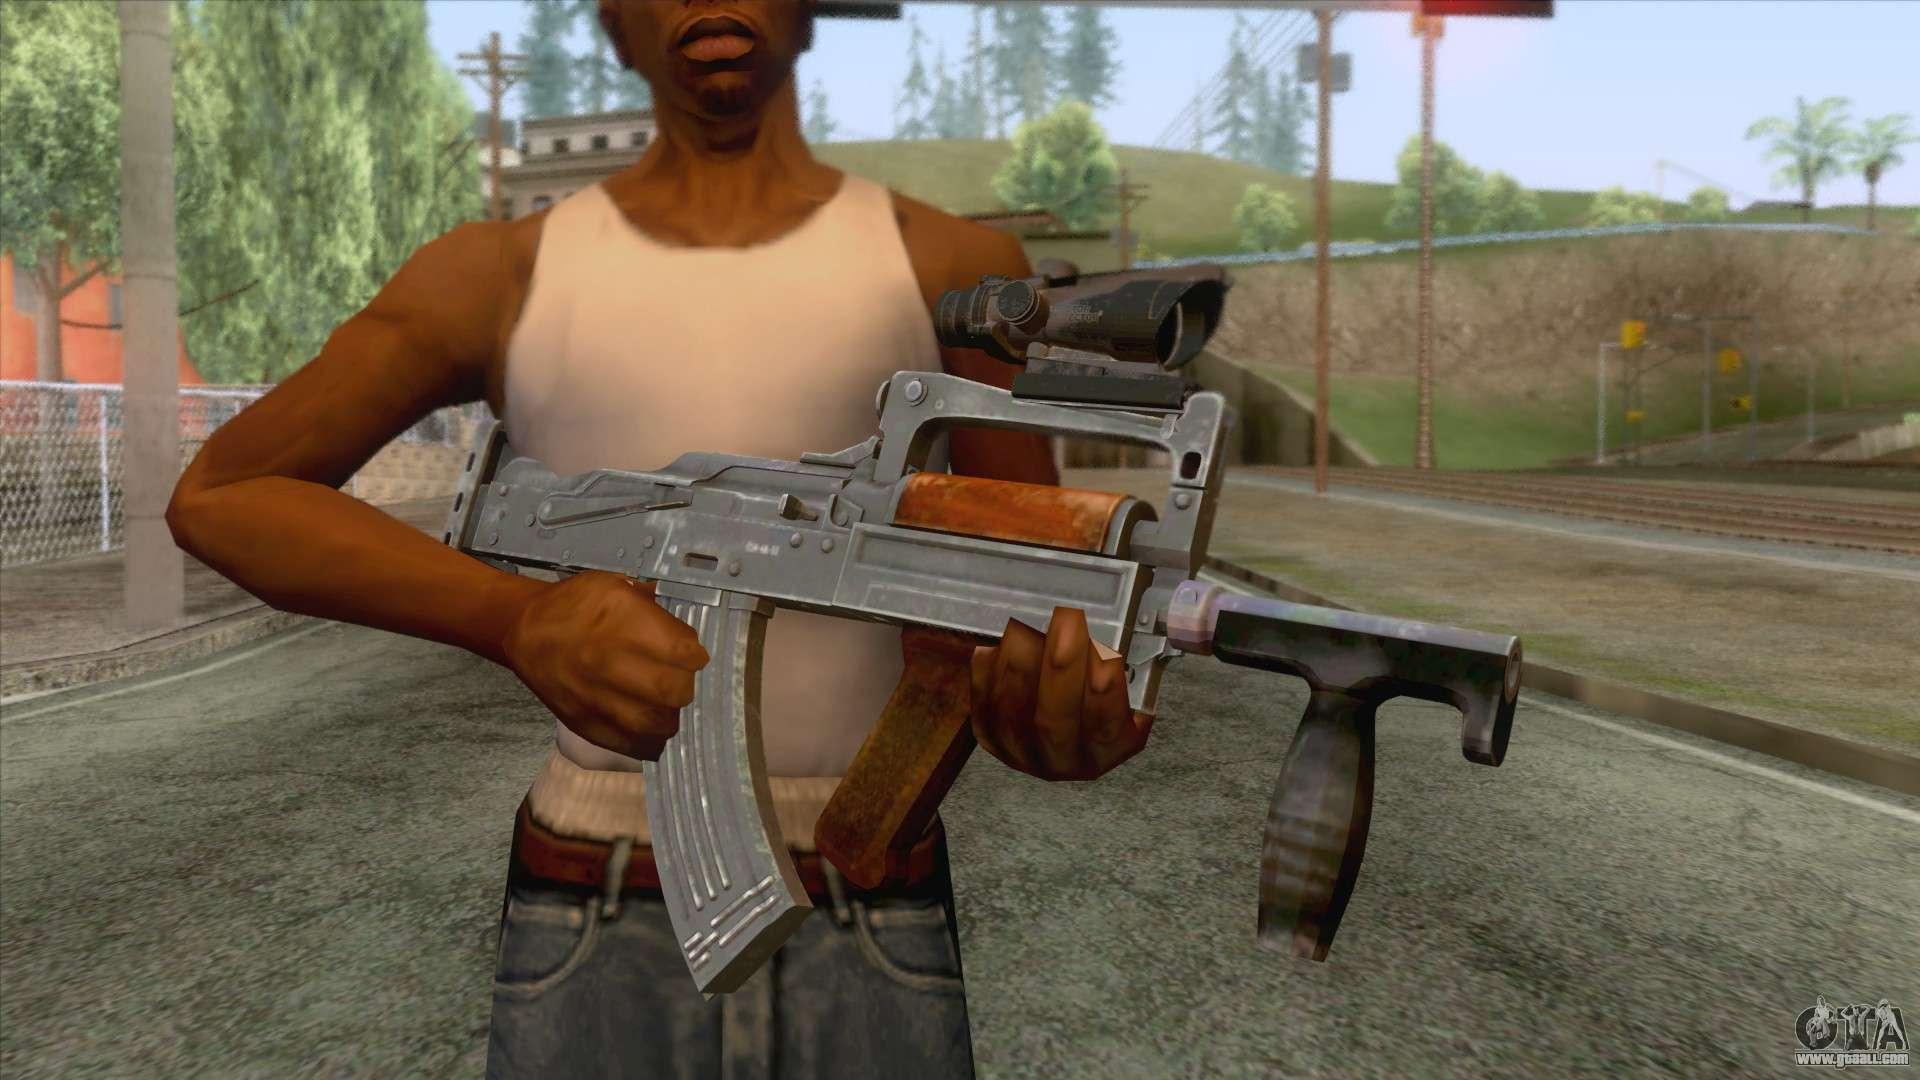 Downaload Woman With Guns Playerunknown S Battlegrounds: OTs-14 Groza V2 For GTA San